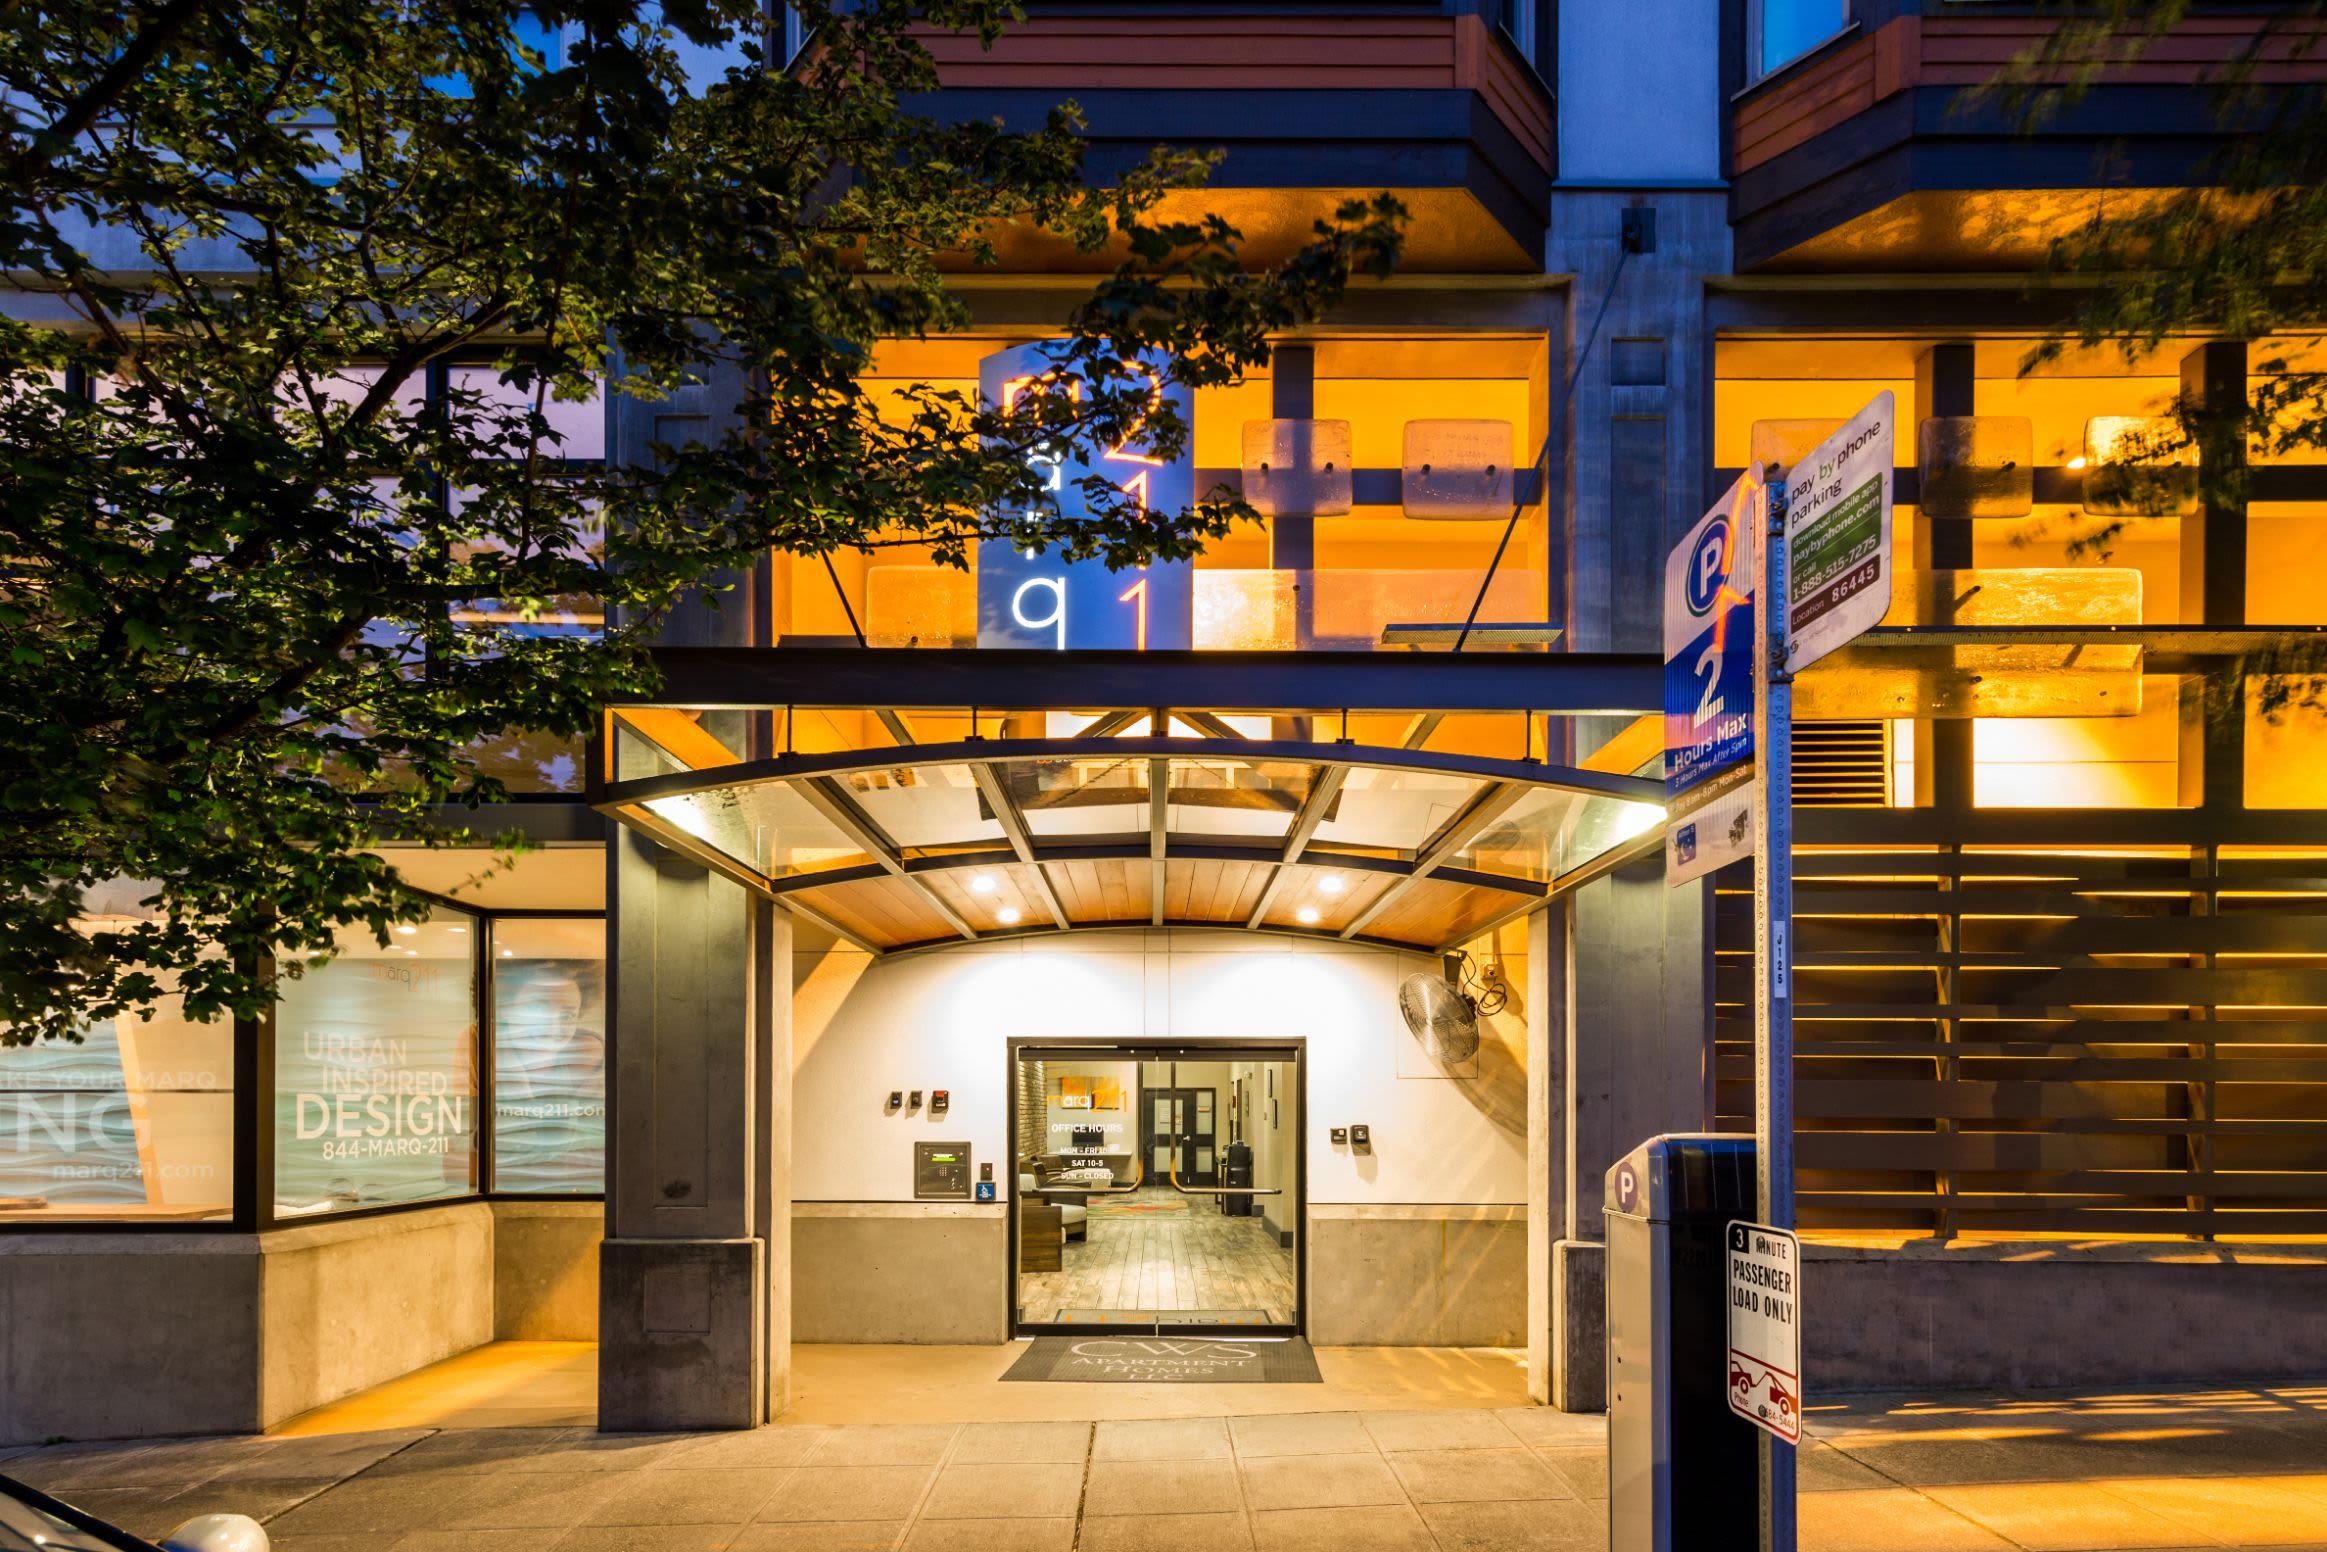 Street entrance at Marq 211 in Seattle, Washington